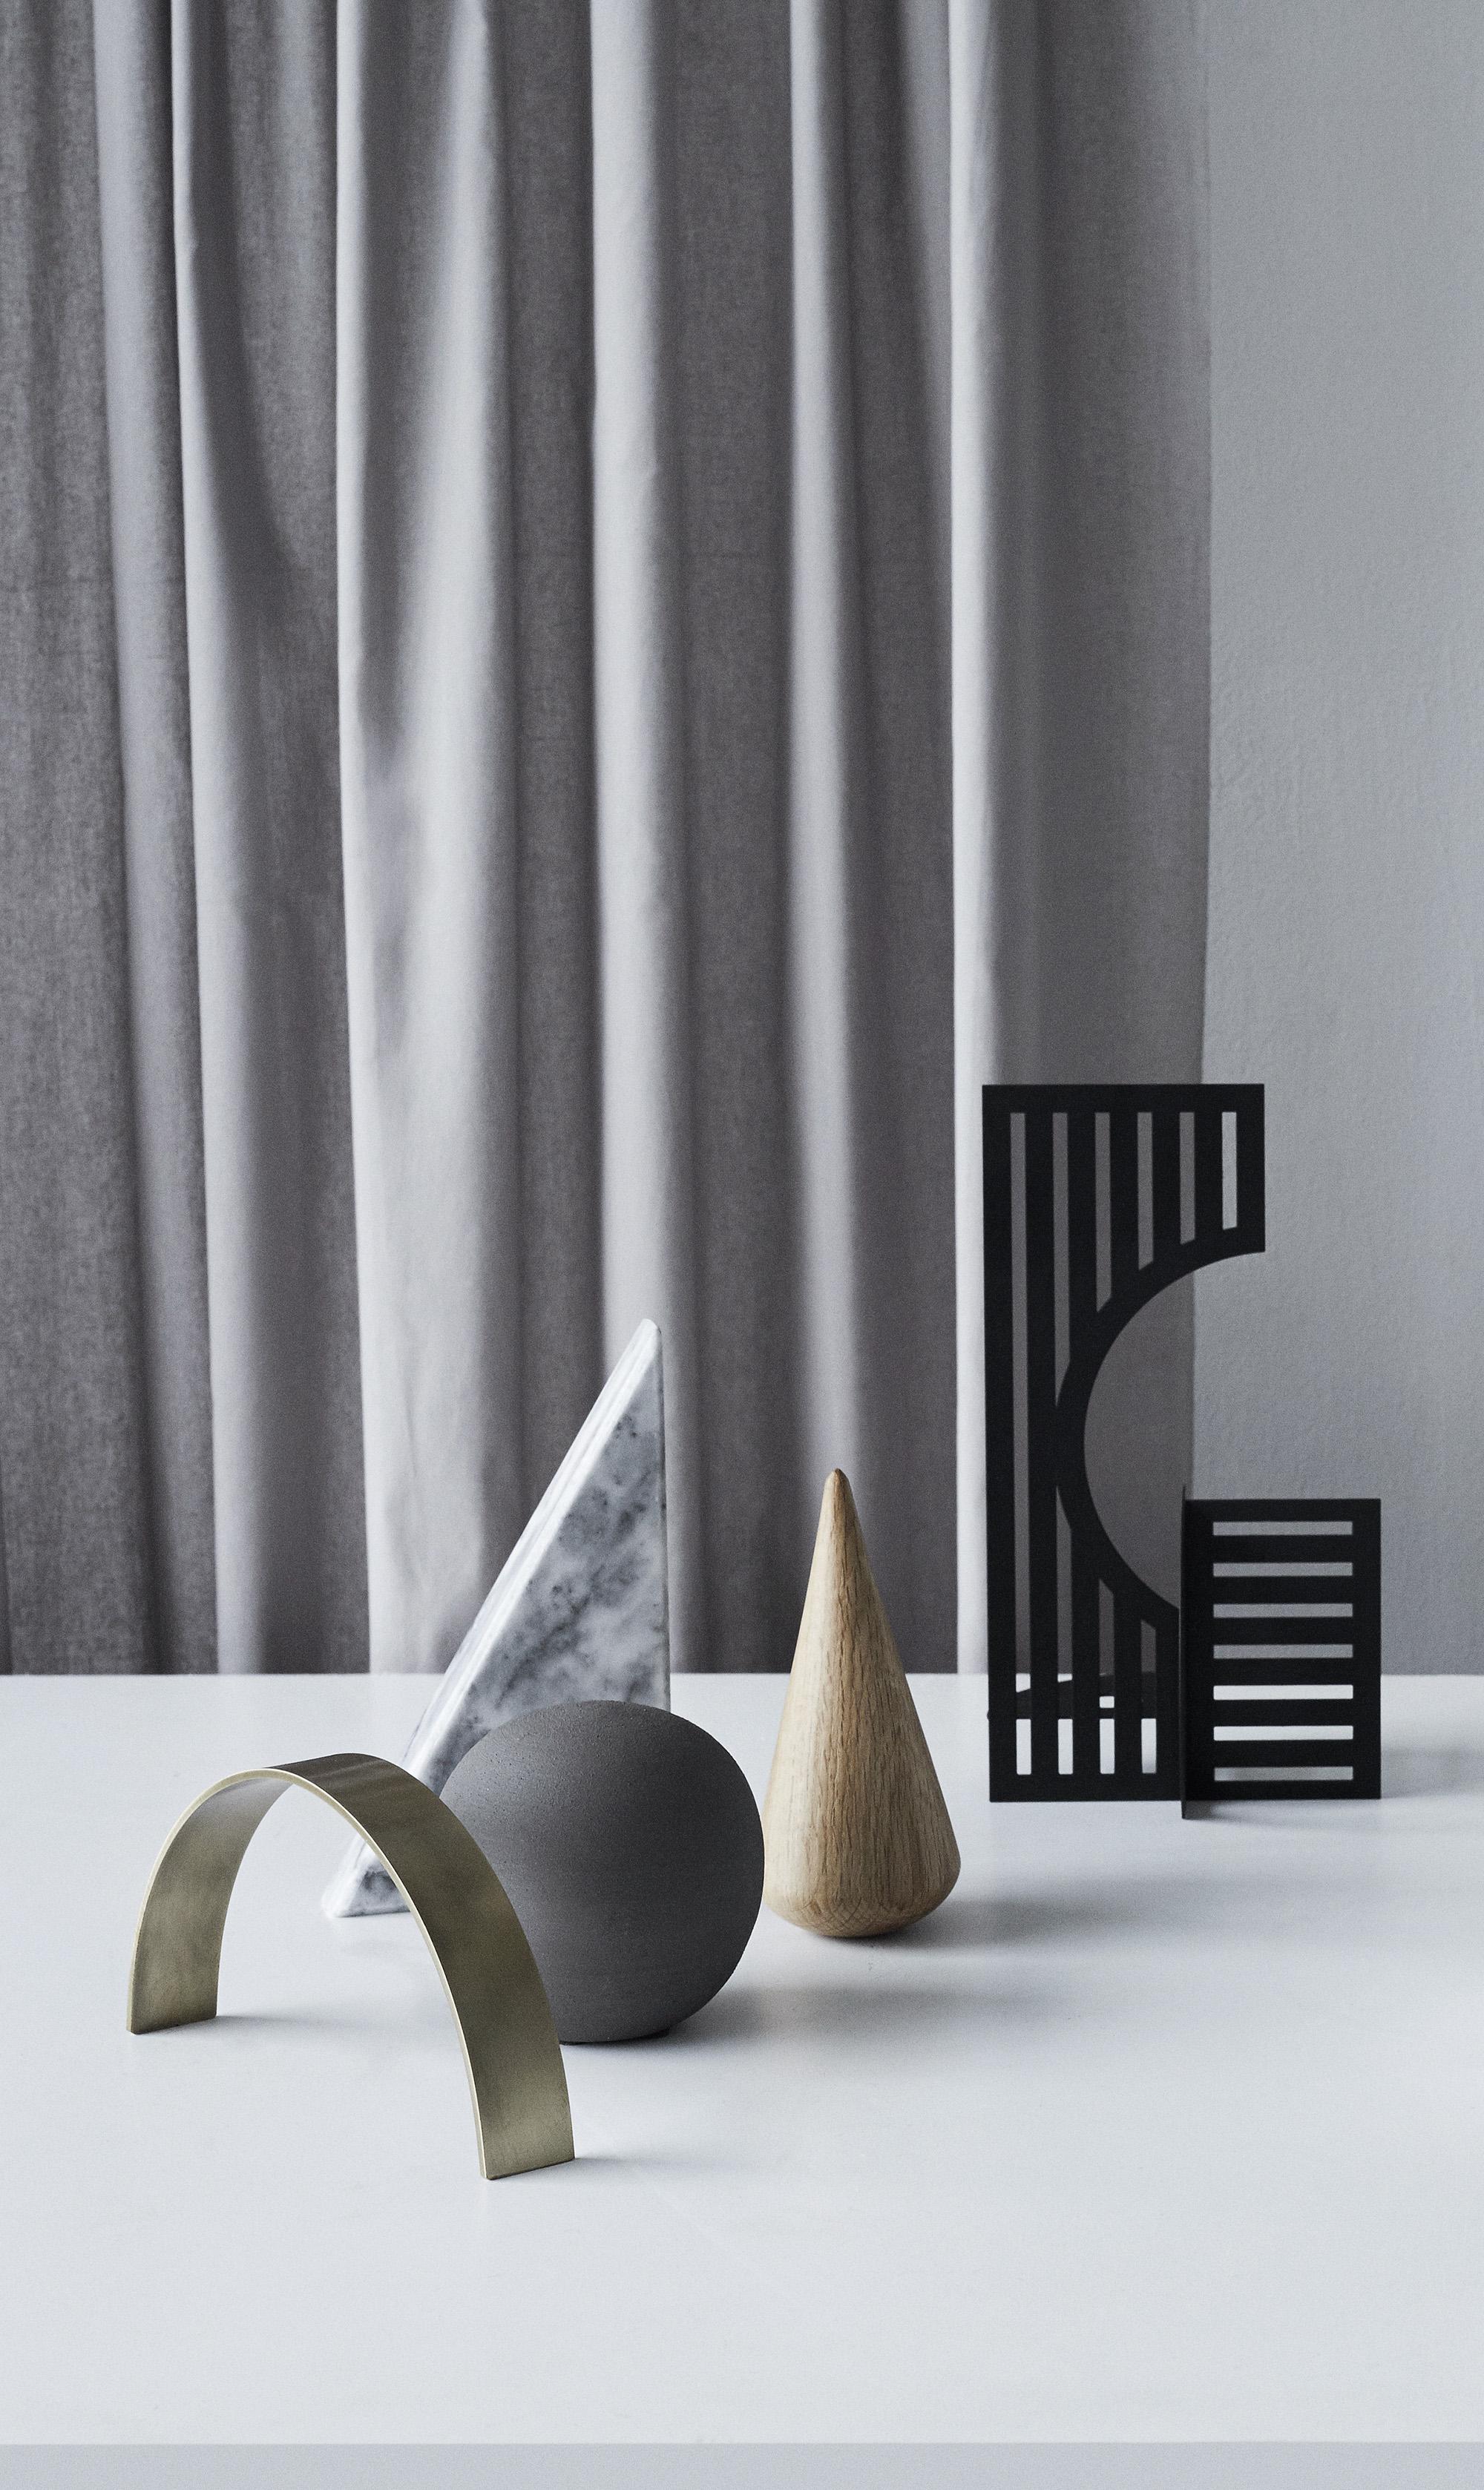 Desk Sculptures by Kristina Dam